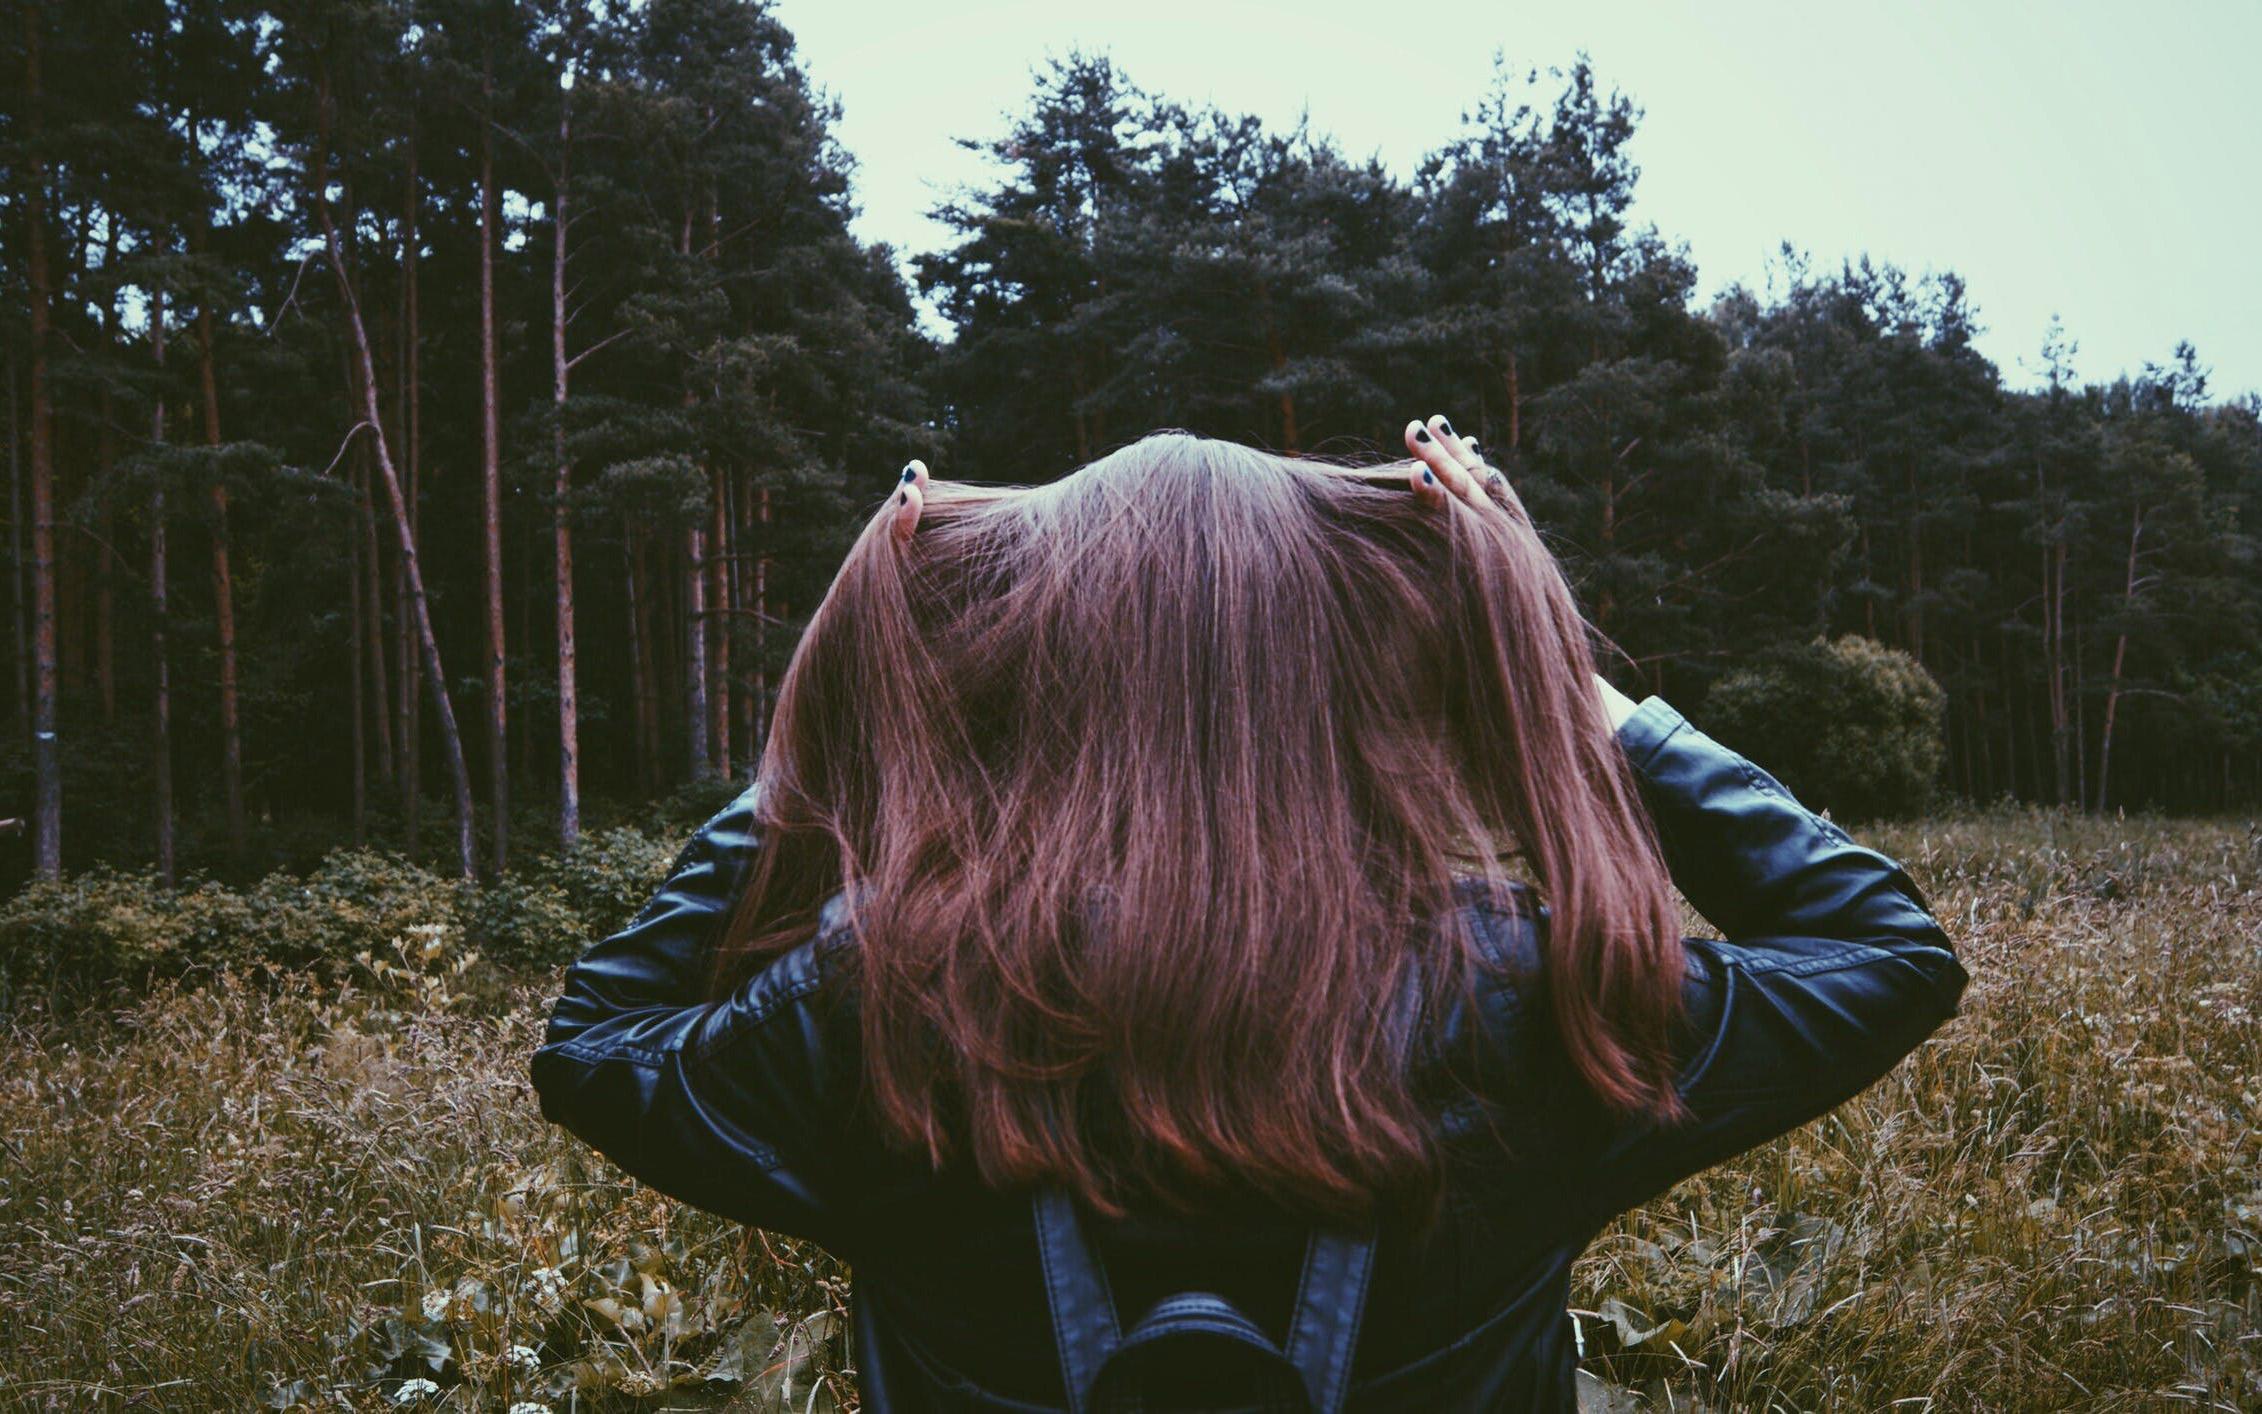 hair-girl-forest